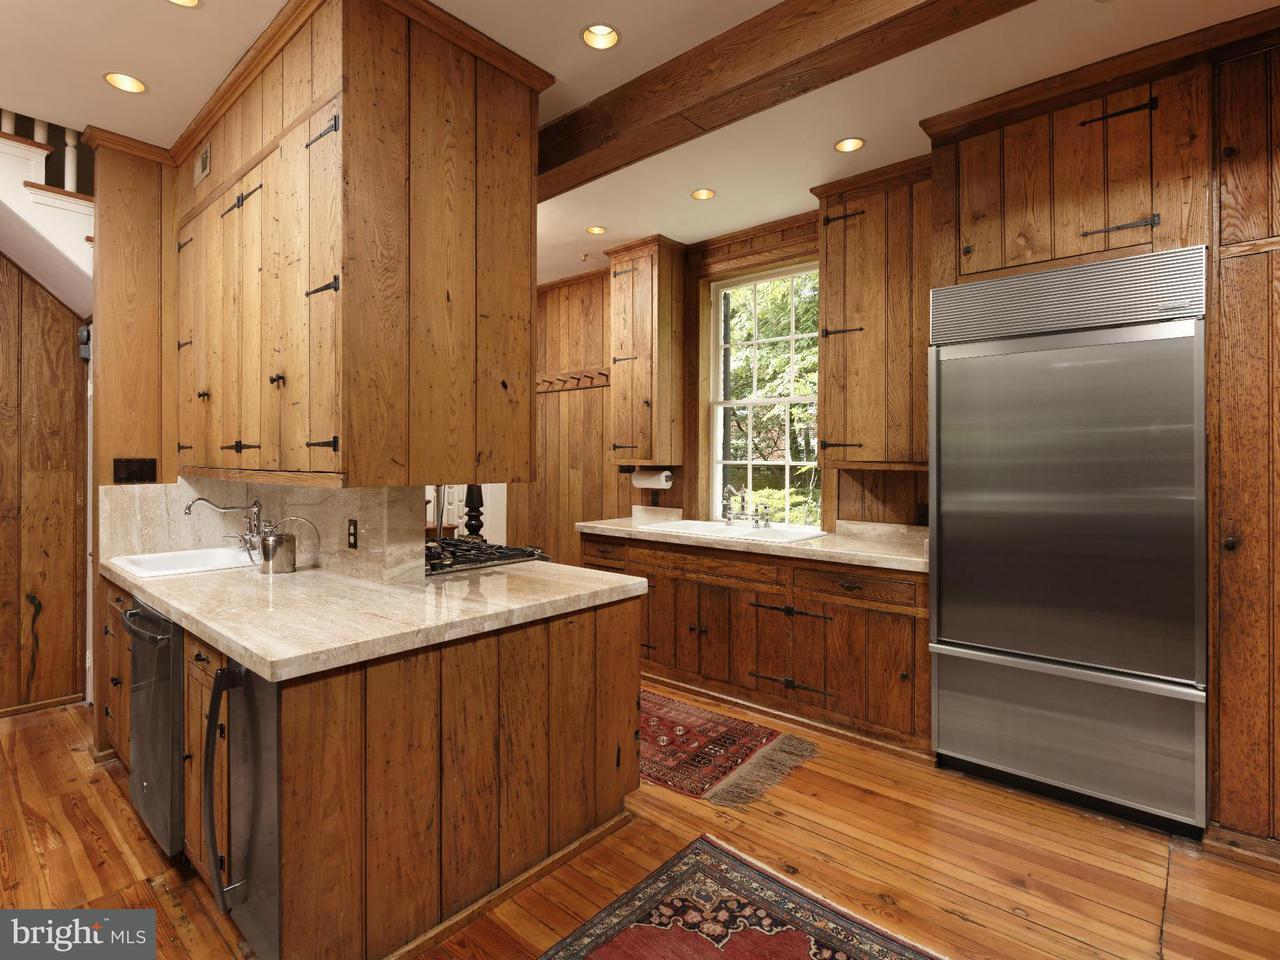 Additional photo for property listing at 301 SAINT ASAPH ST S 301 SAINT ASAPH ST S Alexandria, Virginia 22314 United States